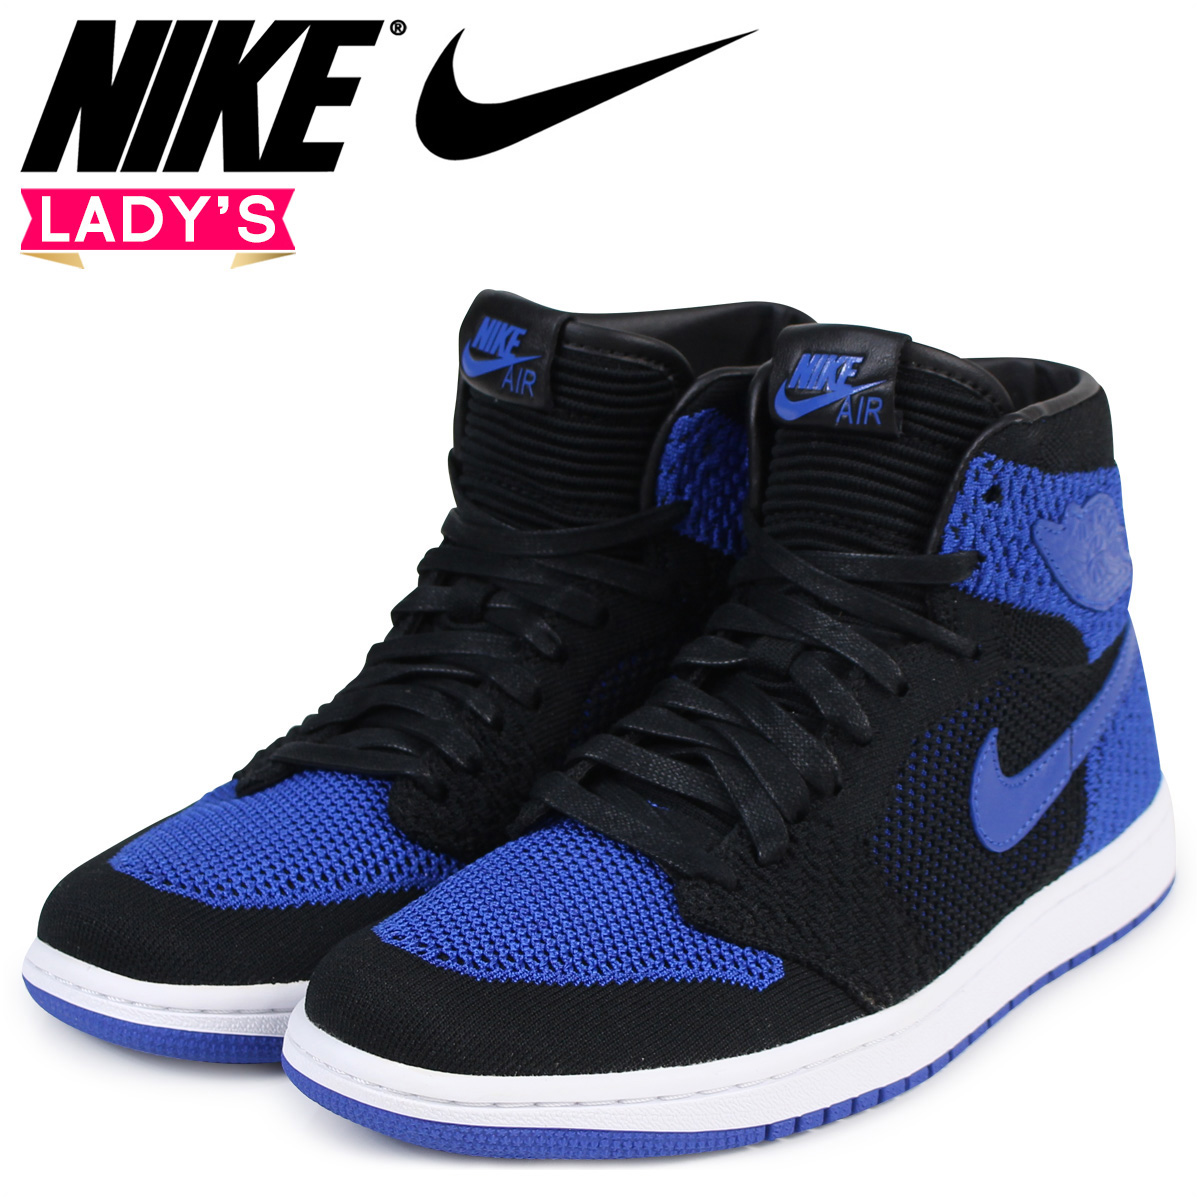 cheaper ed2fa 7638e NIKE Nike Air Jordan 1 nostalgic Haile Dis sneakers AIR JORDAN 1 RETRO HI  FLYKNIT BG 919,702-006 shoes blue  load planned Shinnyu load in reservation  ...